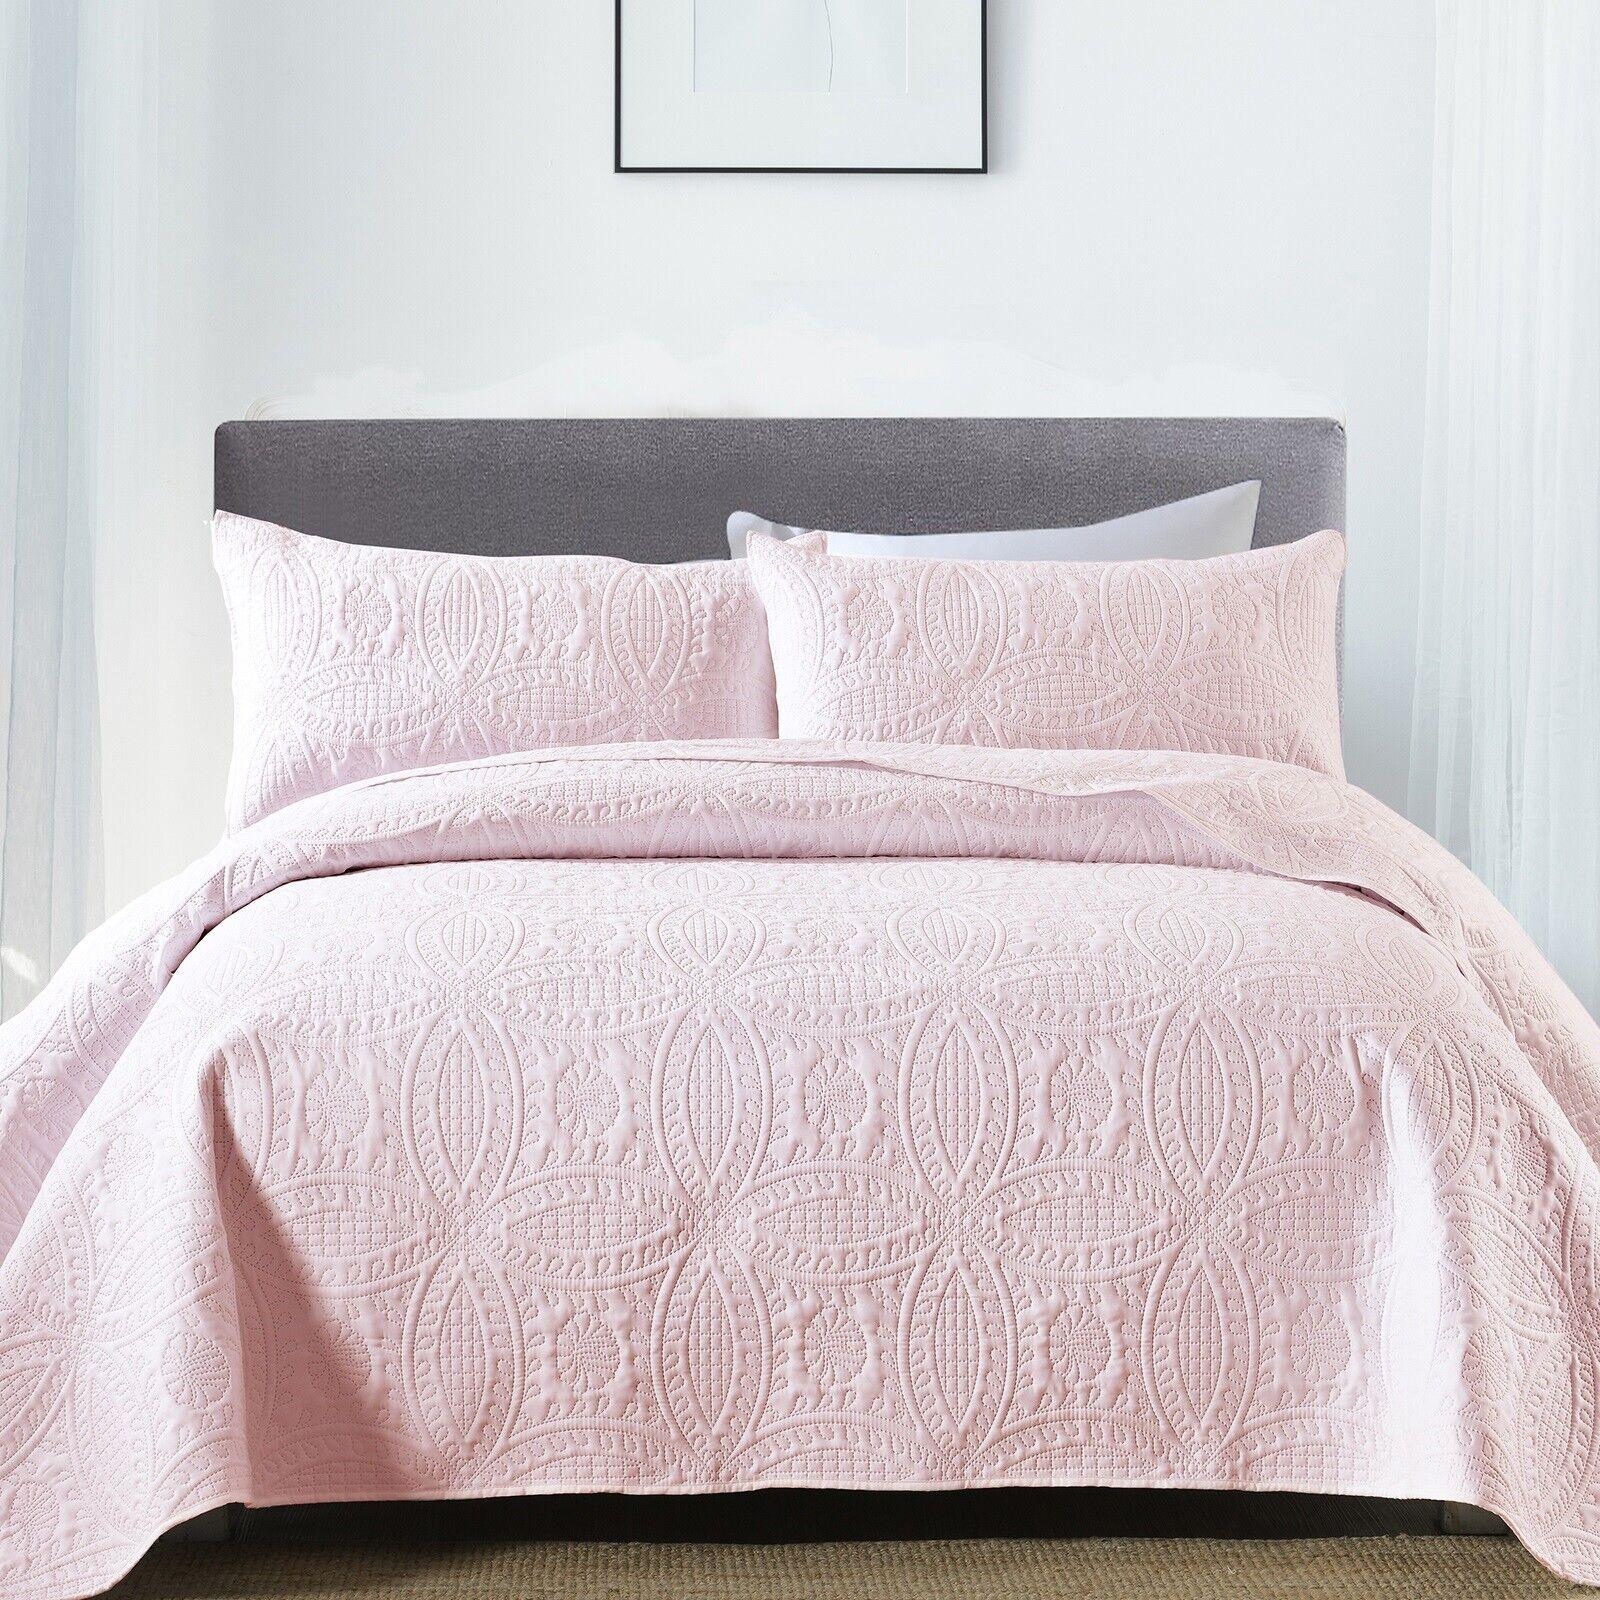 3-Piece Queen King Quilt Set Soft Coverlet Bedding Bedspread